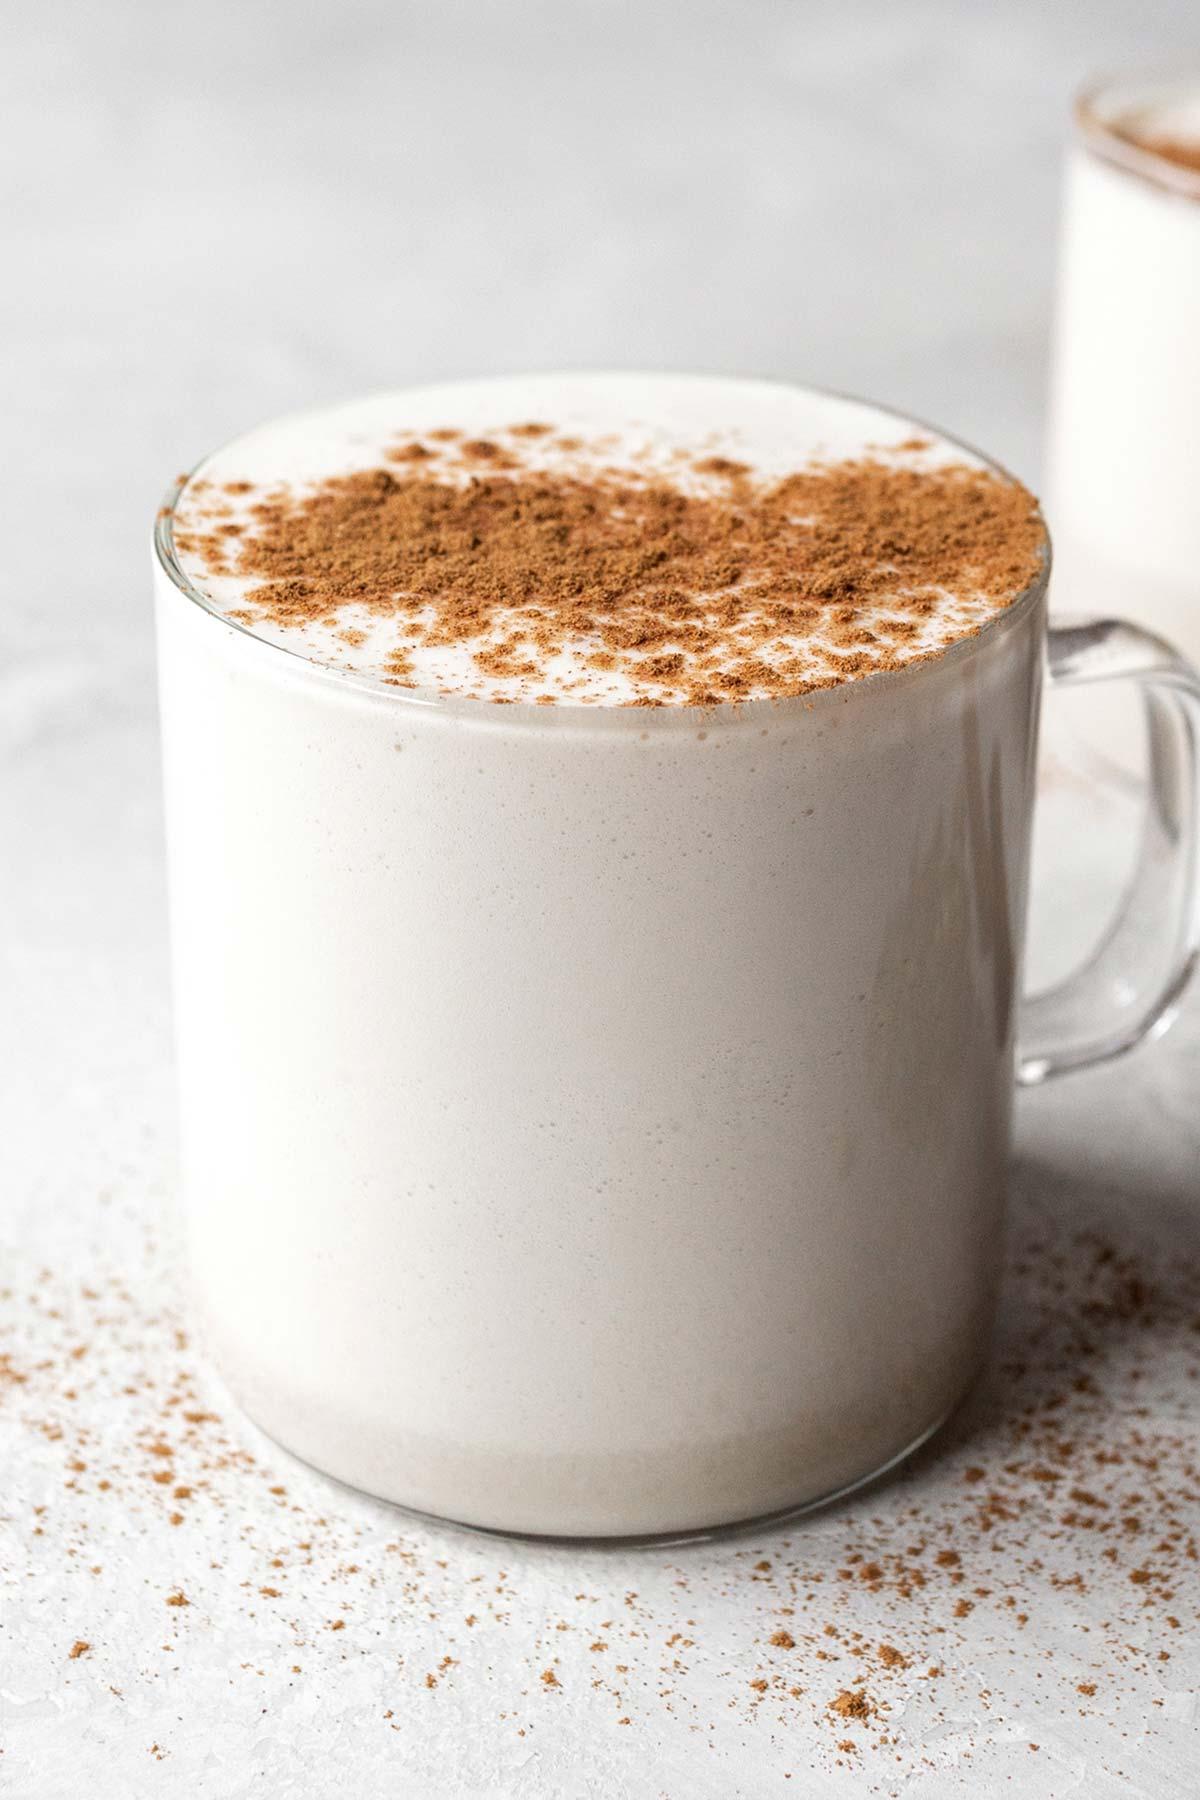 Chamomile tea latte with ground cinnamon garnish in a glass mug.